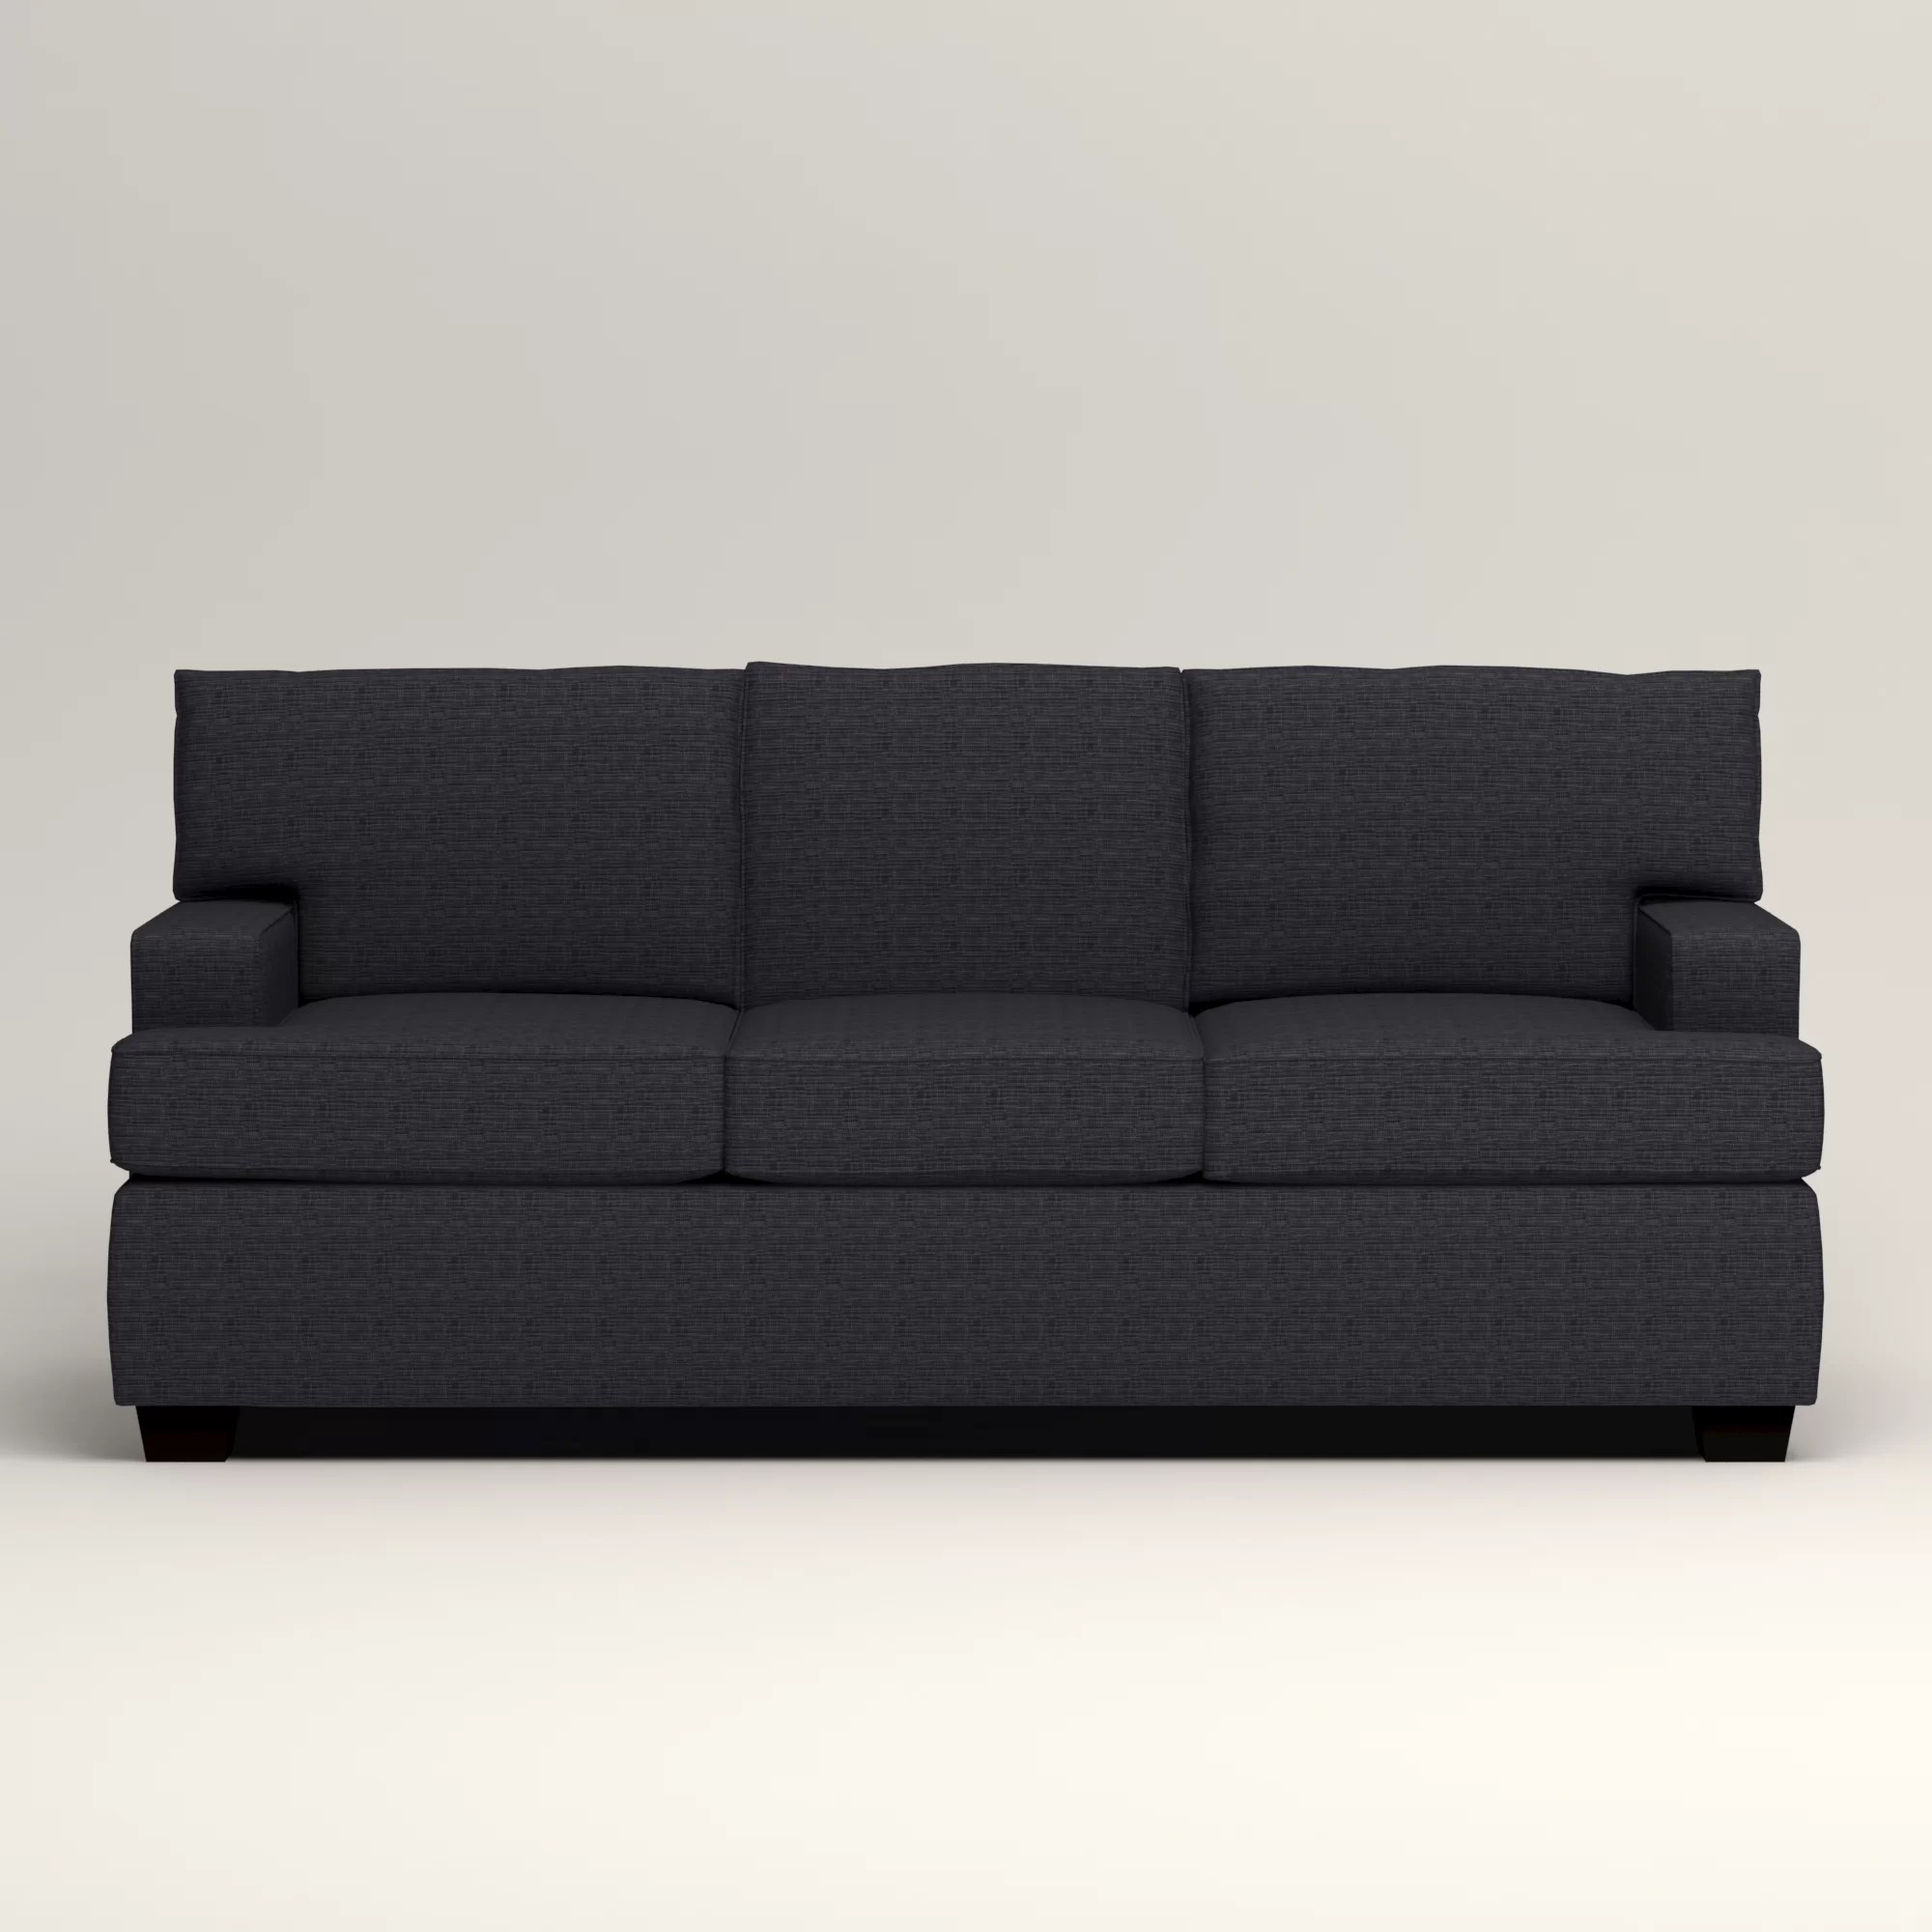 Where Buy Sleeper Sofa